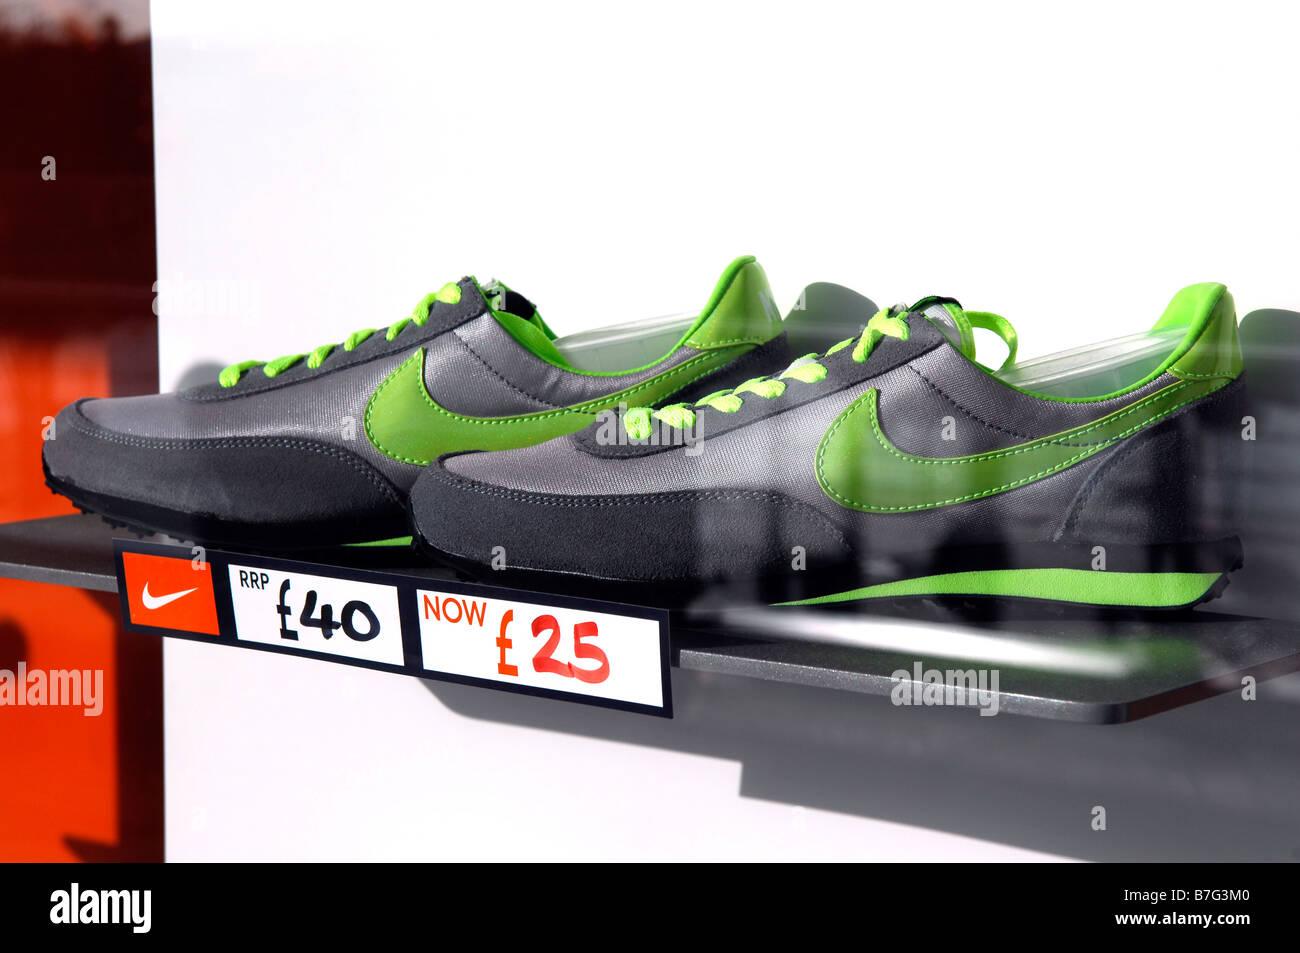 nike footwear trainers training shoes window display reduced american  company fashion retail shop store niketown -